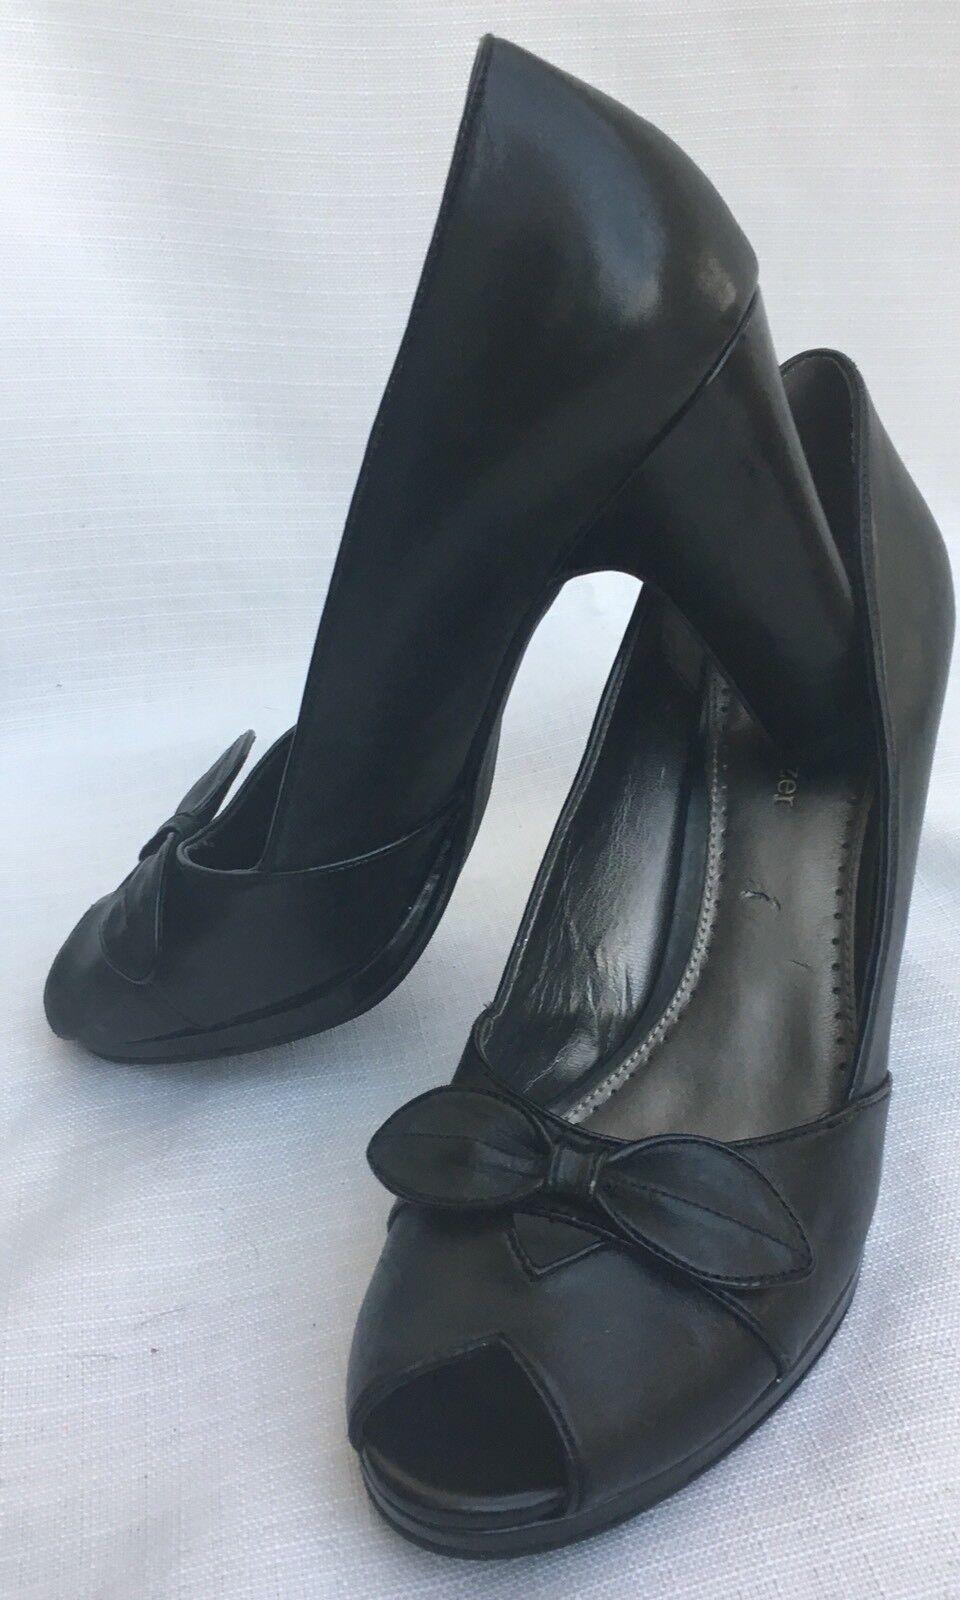 Shoes NATURALIZER 3.75